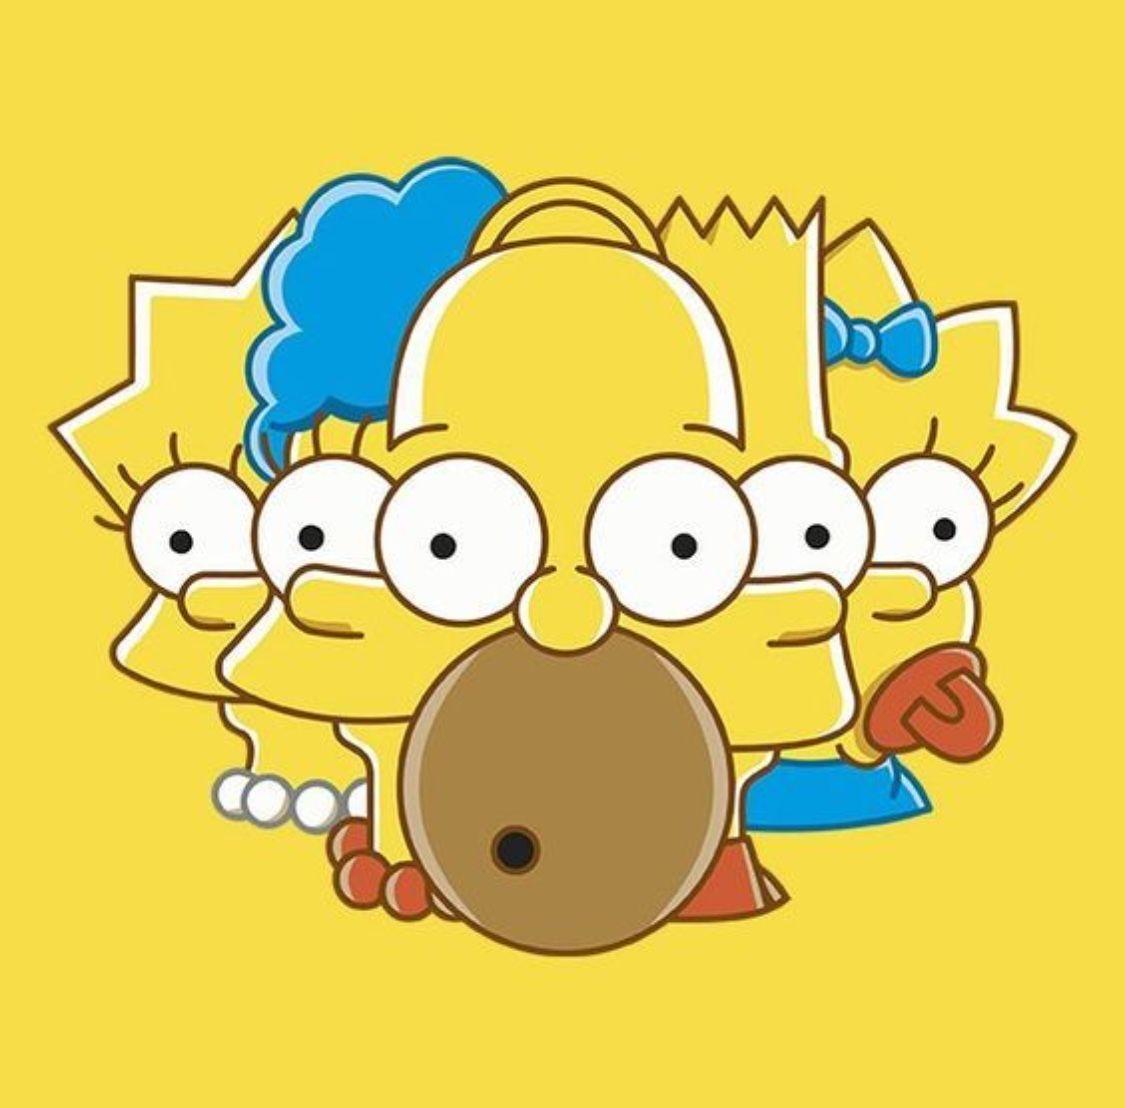 Pin De Carmen Herrera Em The Simpsons